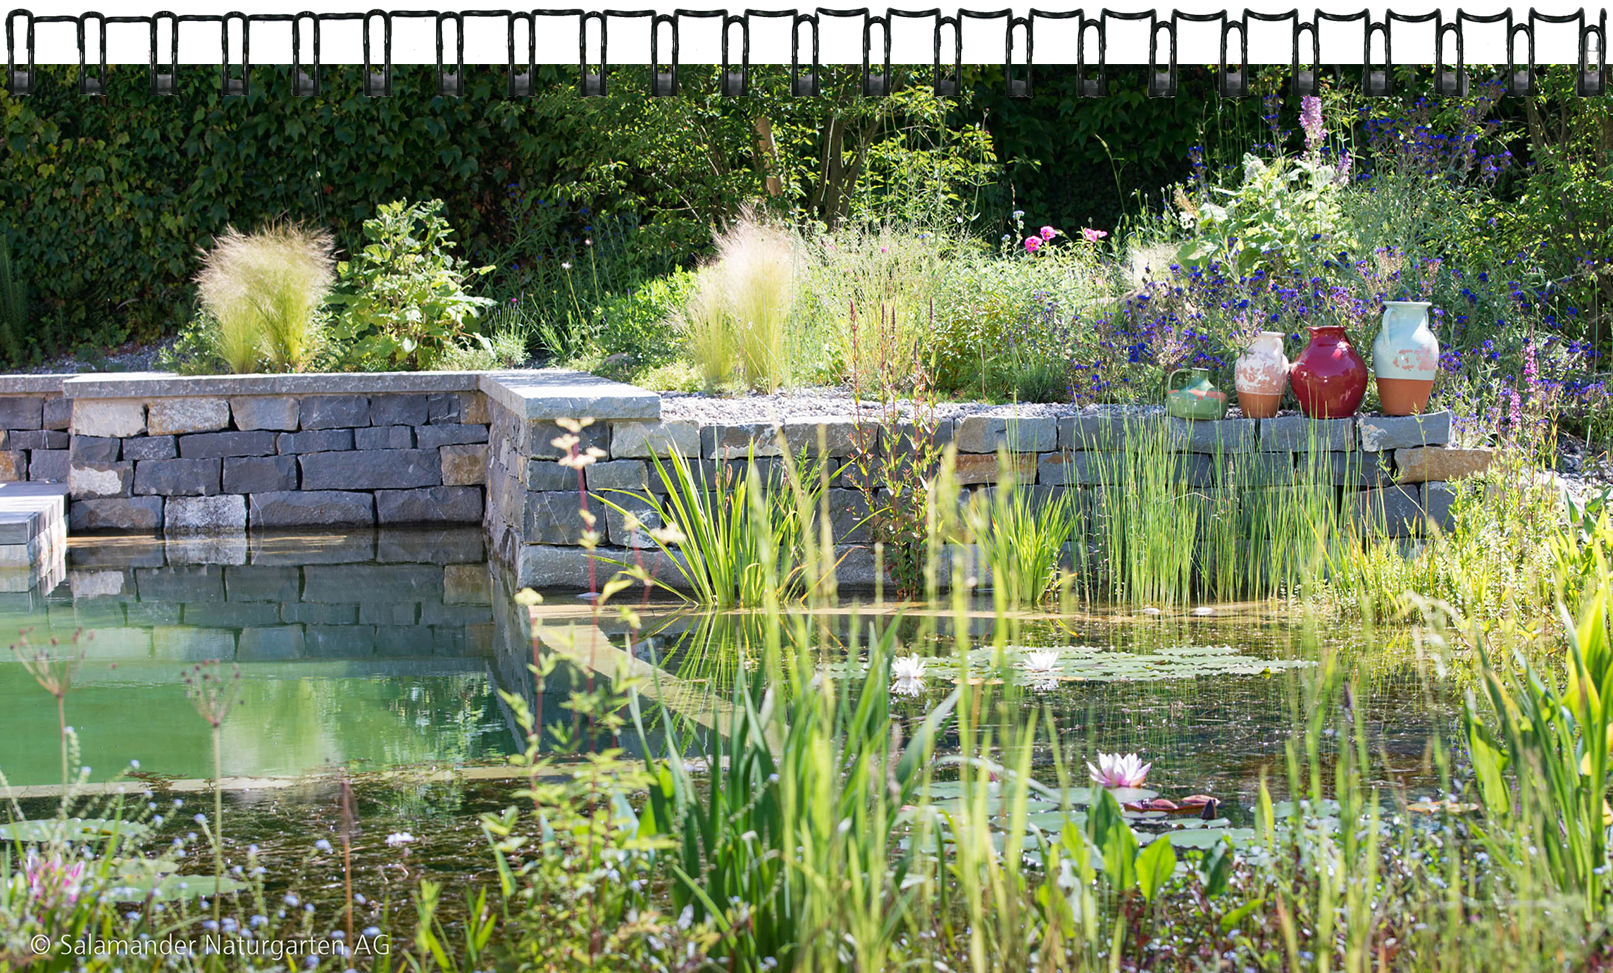 ihr gartenbau spezialist salamander naturgarten ag. Black Bedroom Furniture Sets. Home Design Ideas